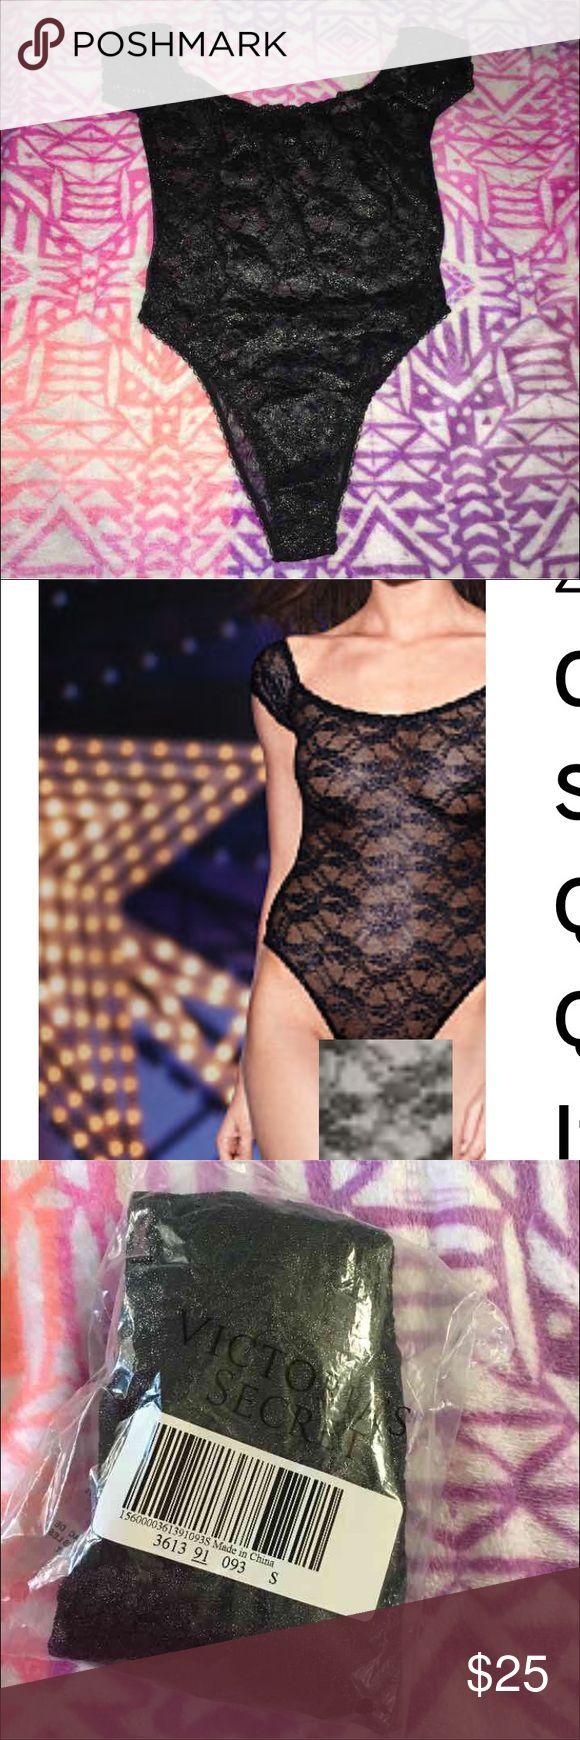 VS Fashion Show Bodysuit New VS Fashion Show Bodysuit still in packaging from online order Victoria's Secret Intimates & Sleepwear Chemises & Slips